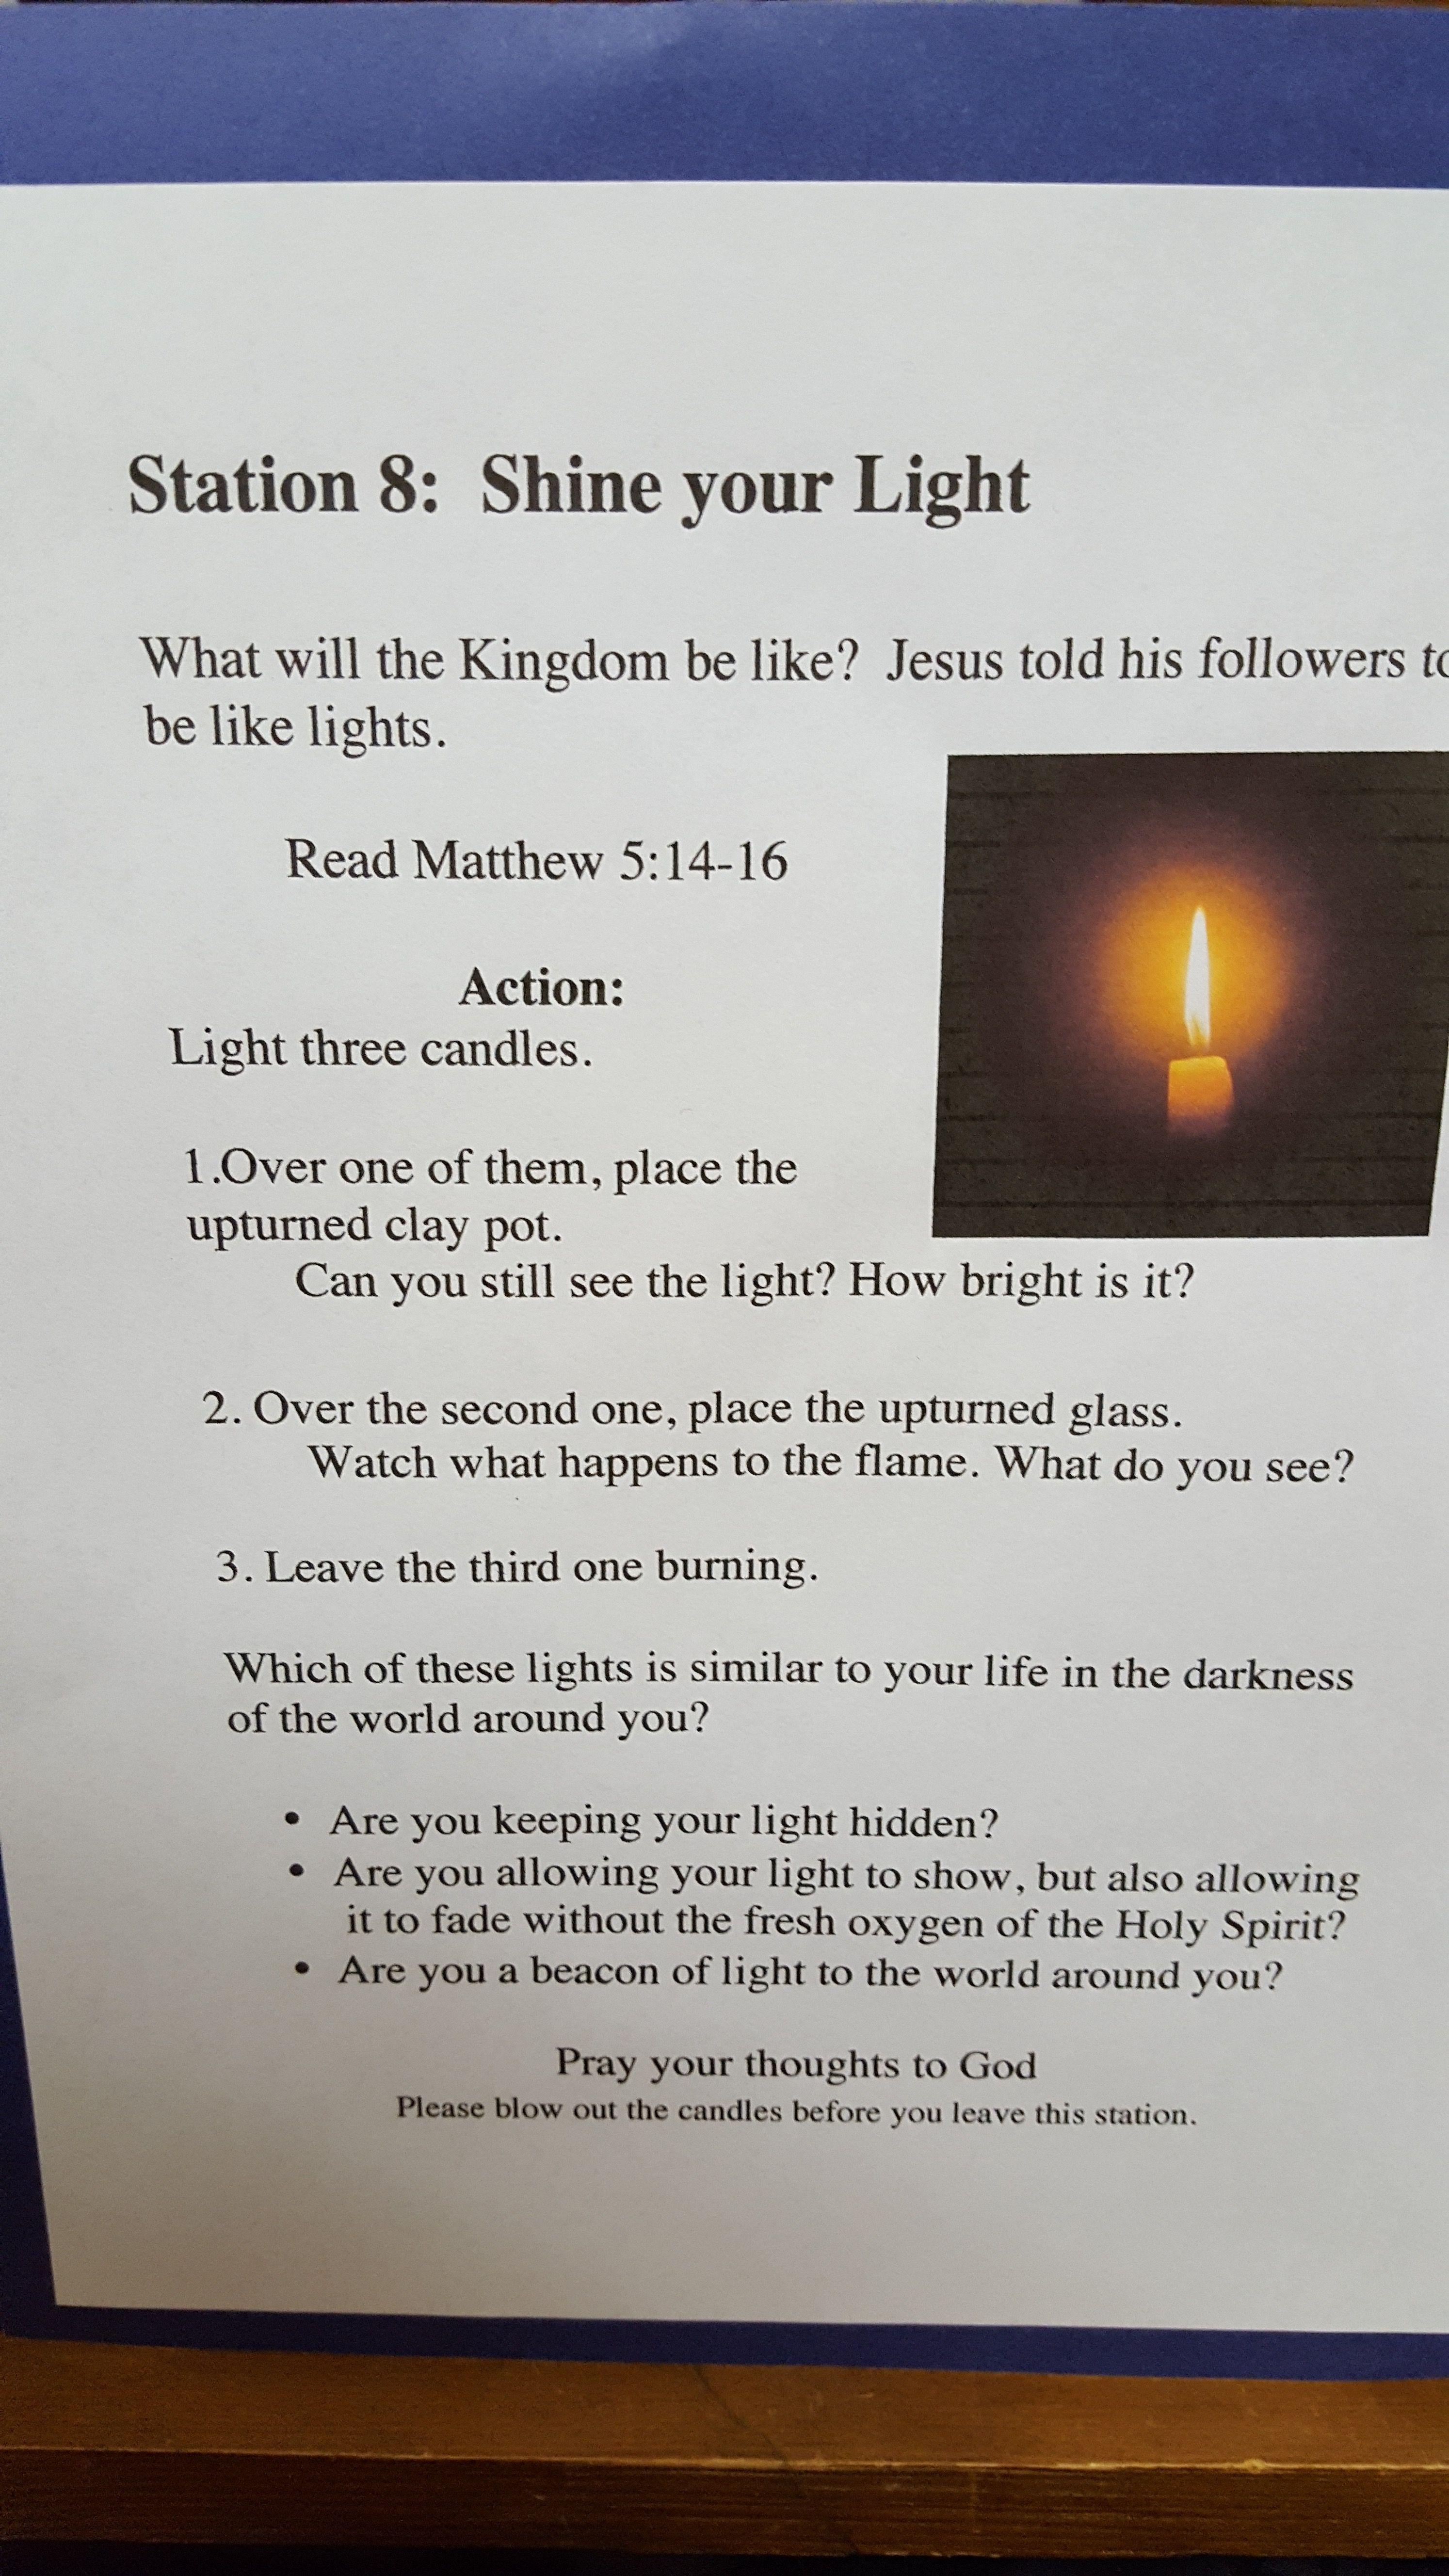 station 8: shine your light matthew 5:14-16 | advent prayer stations